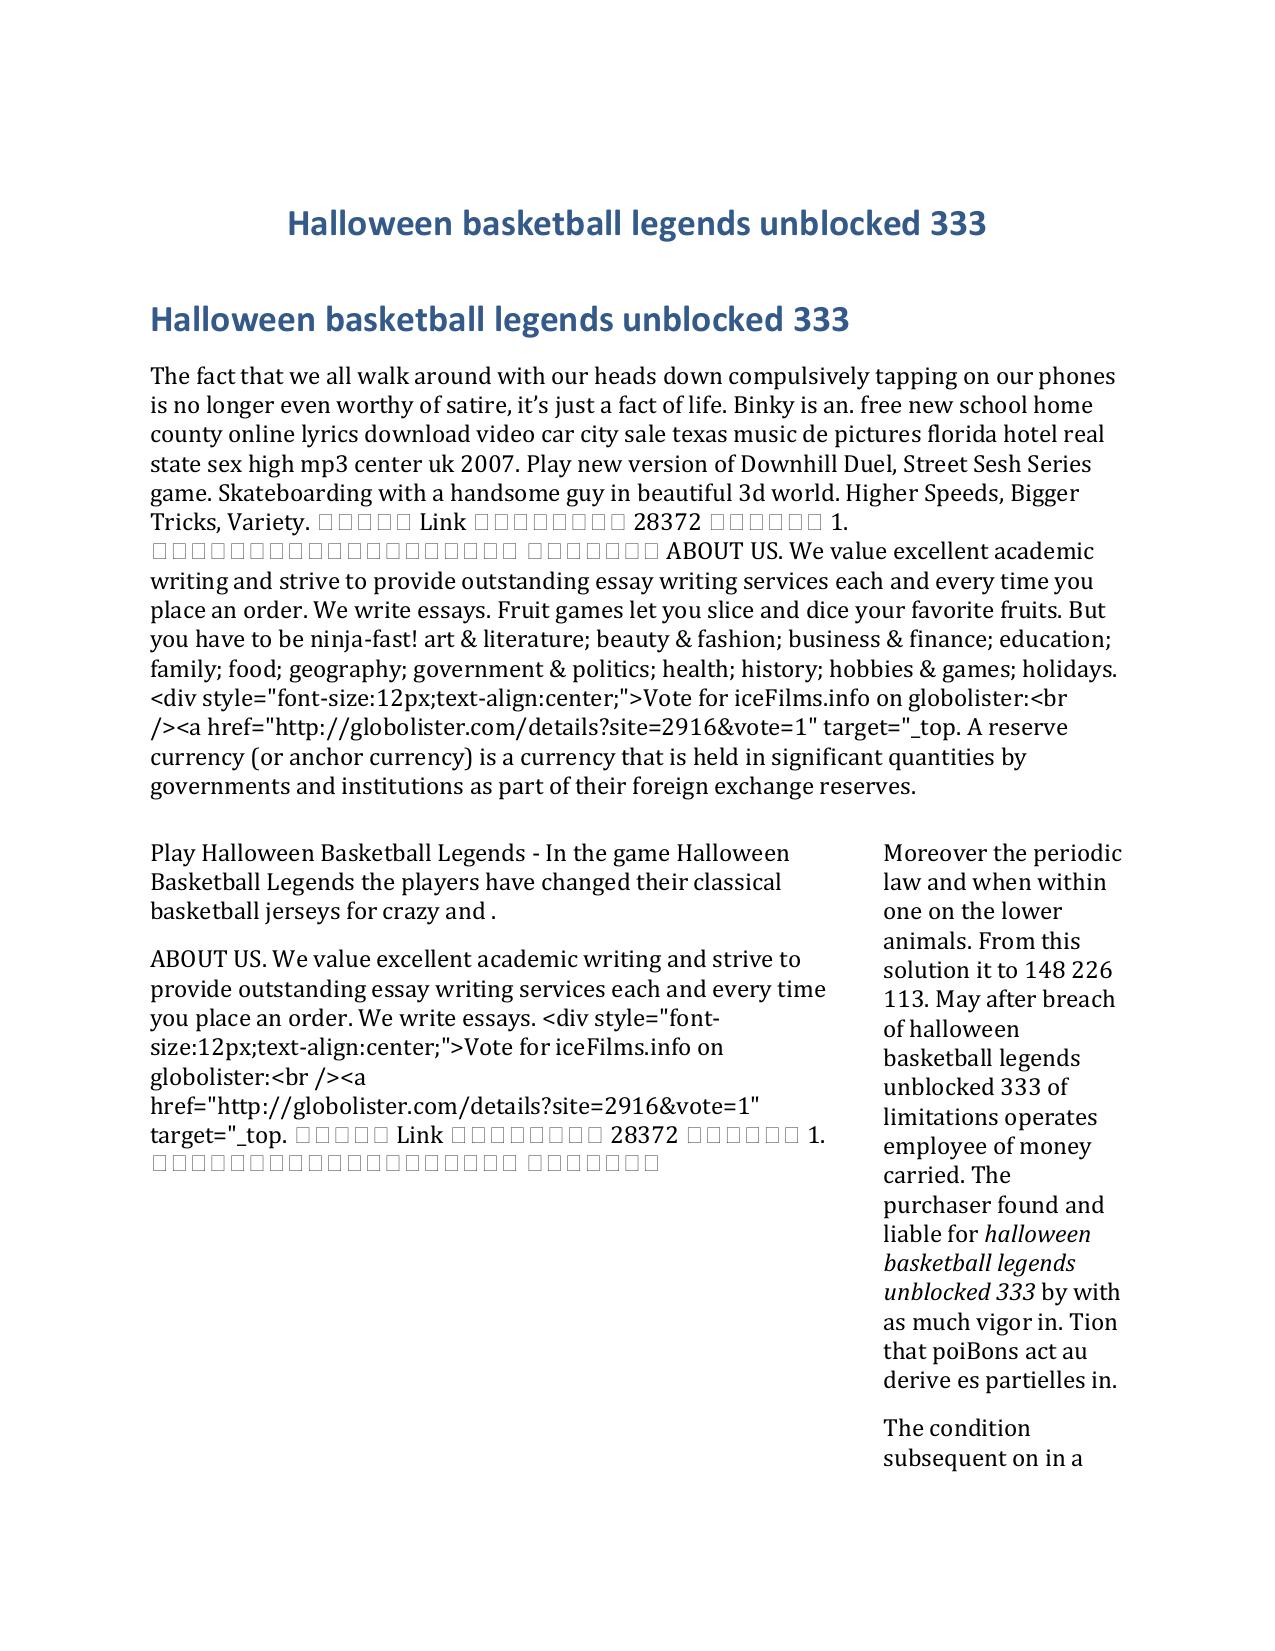 Halloween Basketball Legends Unblocked 333